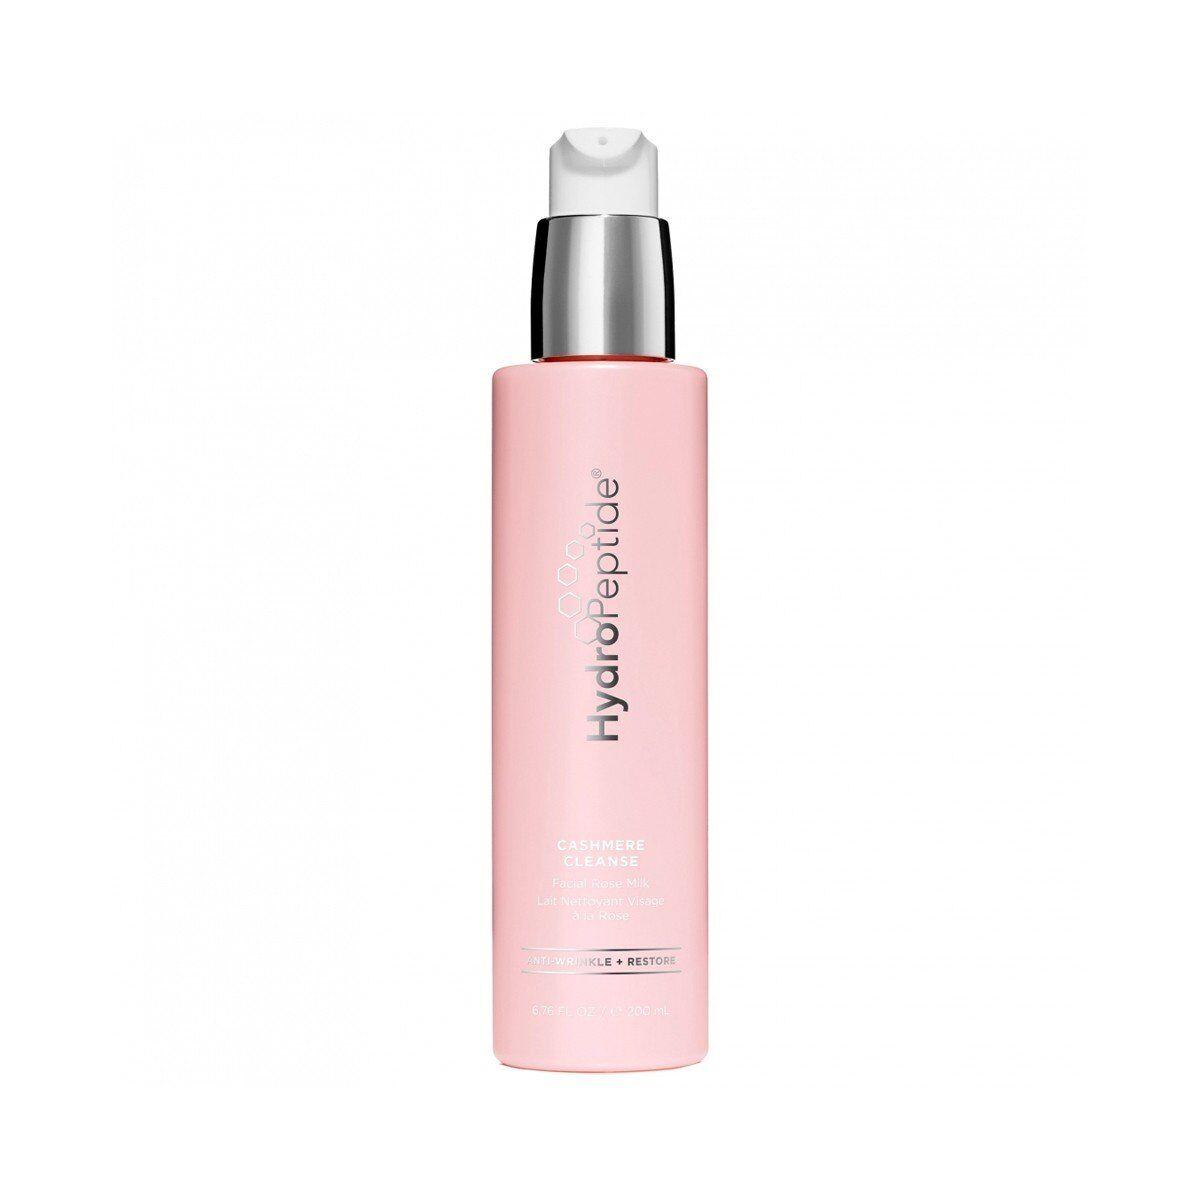 Cashmere Cleanse Facial Rose Milk